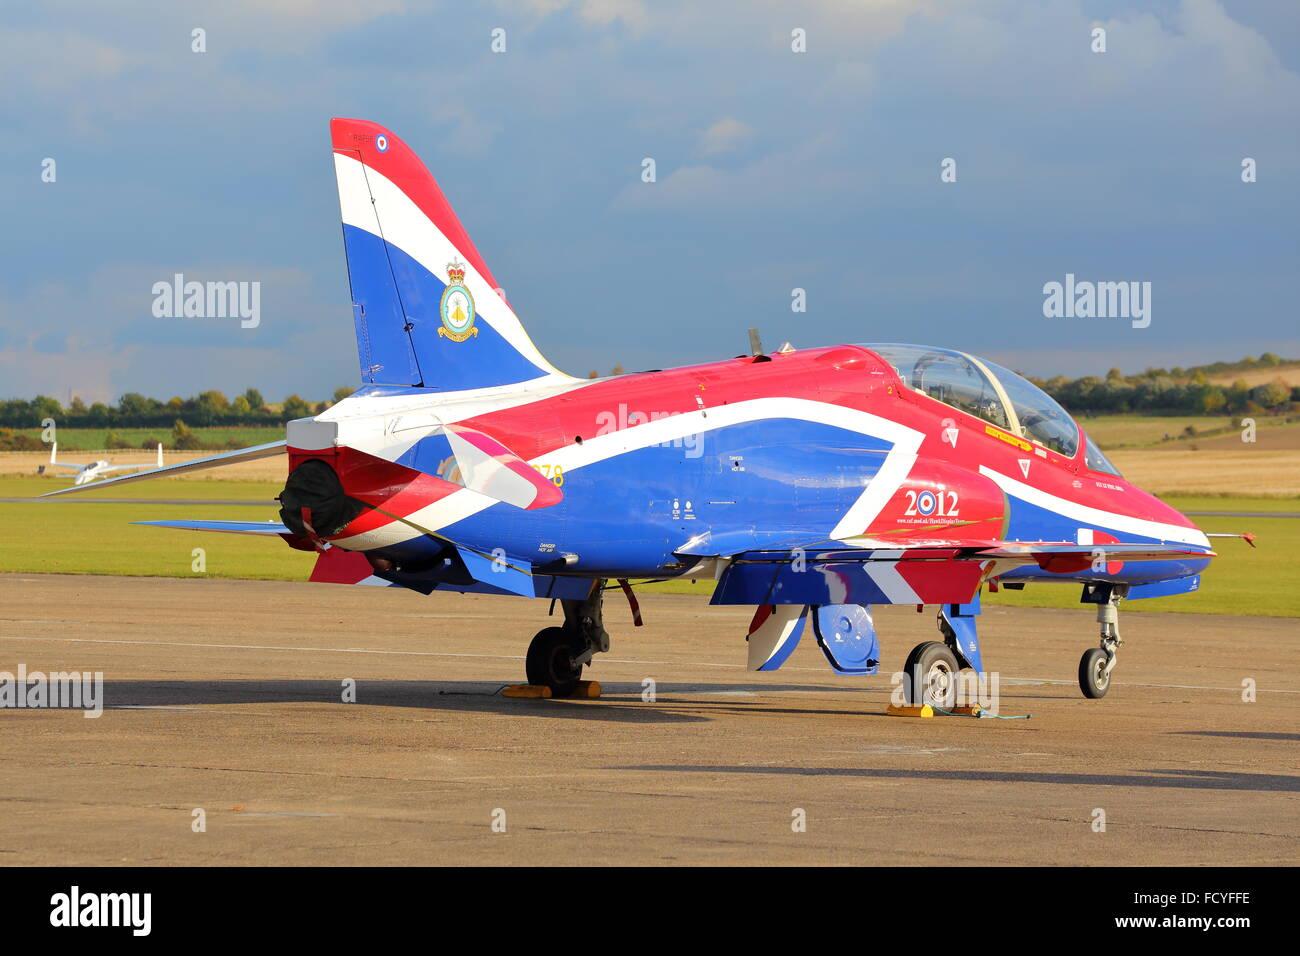 RAF British Aerospace Hawk T.1 XX278 performing at the Duxford Air Show 2012 - Stock Image